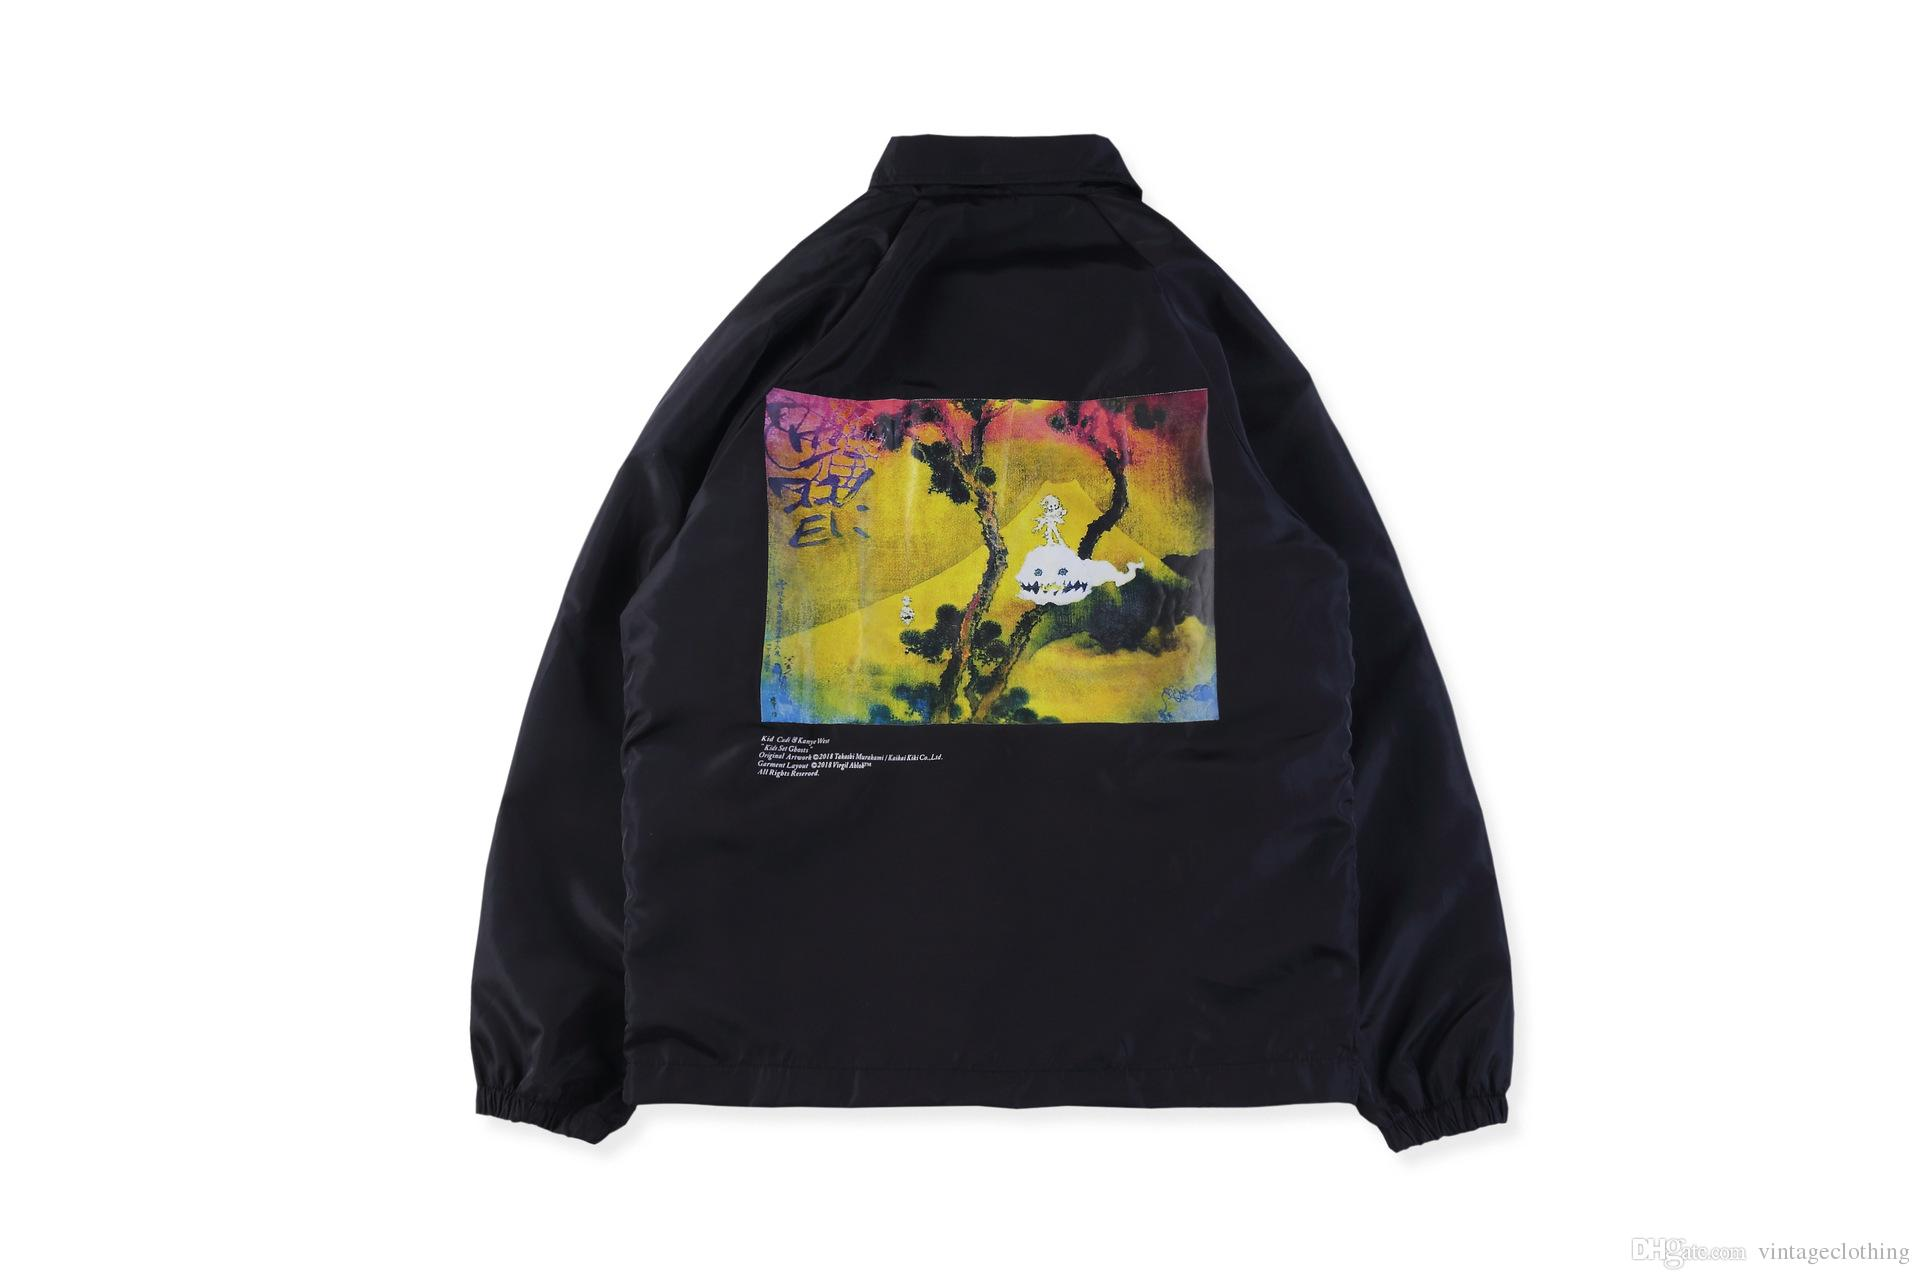 82811eece106 Mens High Street KANYE WEST Button Windbreaker Streetwear Casual Jackets  Coat Fear Of God Hip Hop Black Trench Coats Cool Coats For Men Coats And  Jackets ...